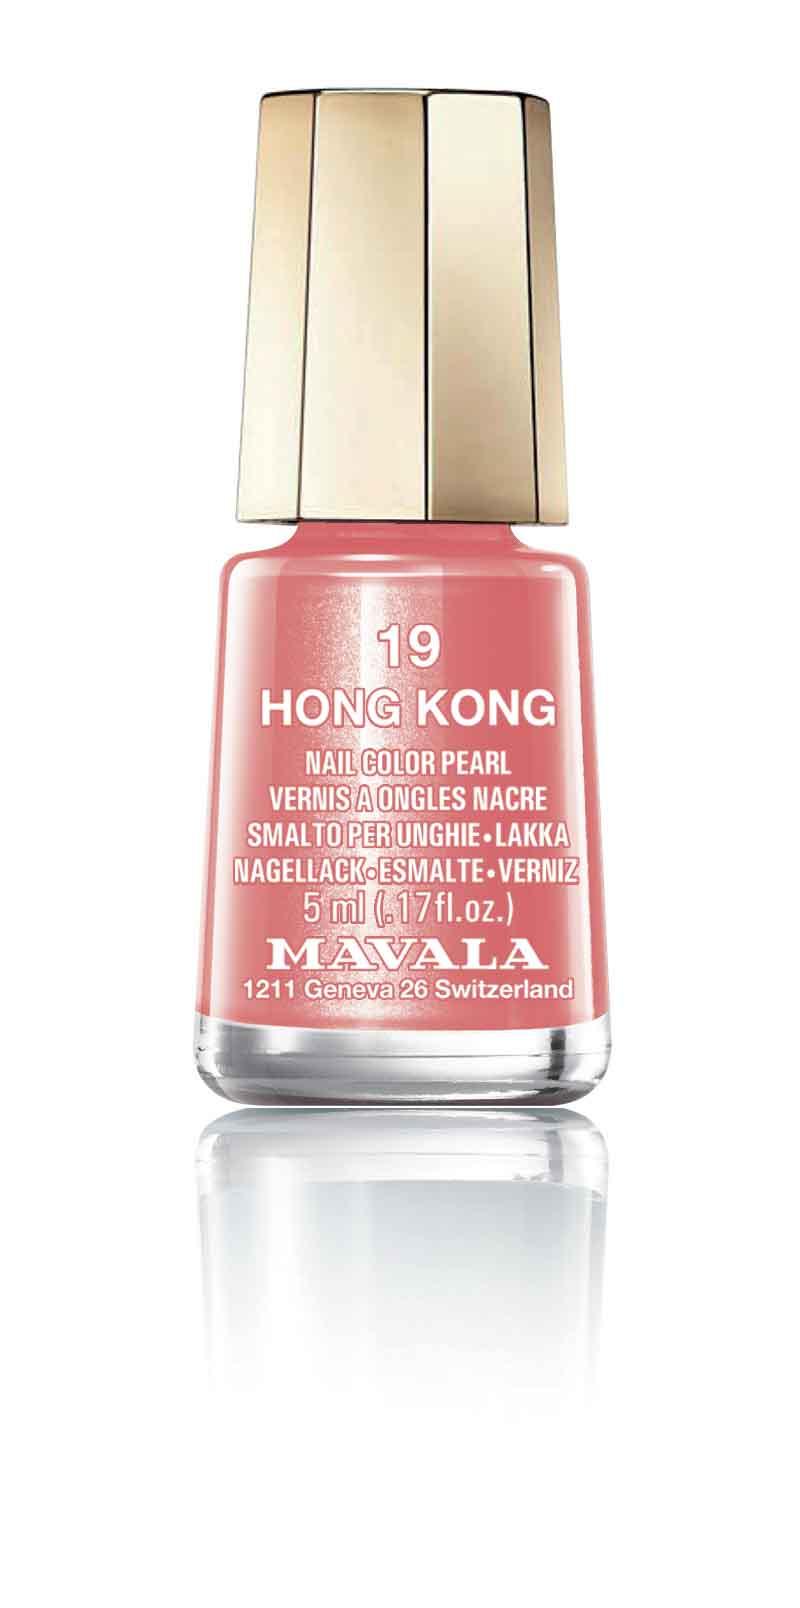 19 HONG KONG*